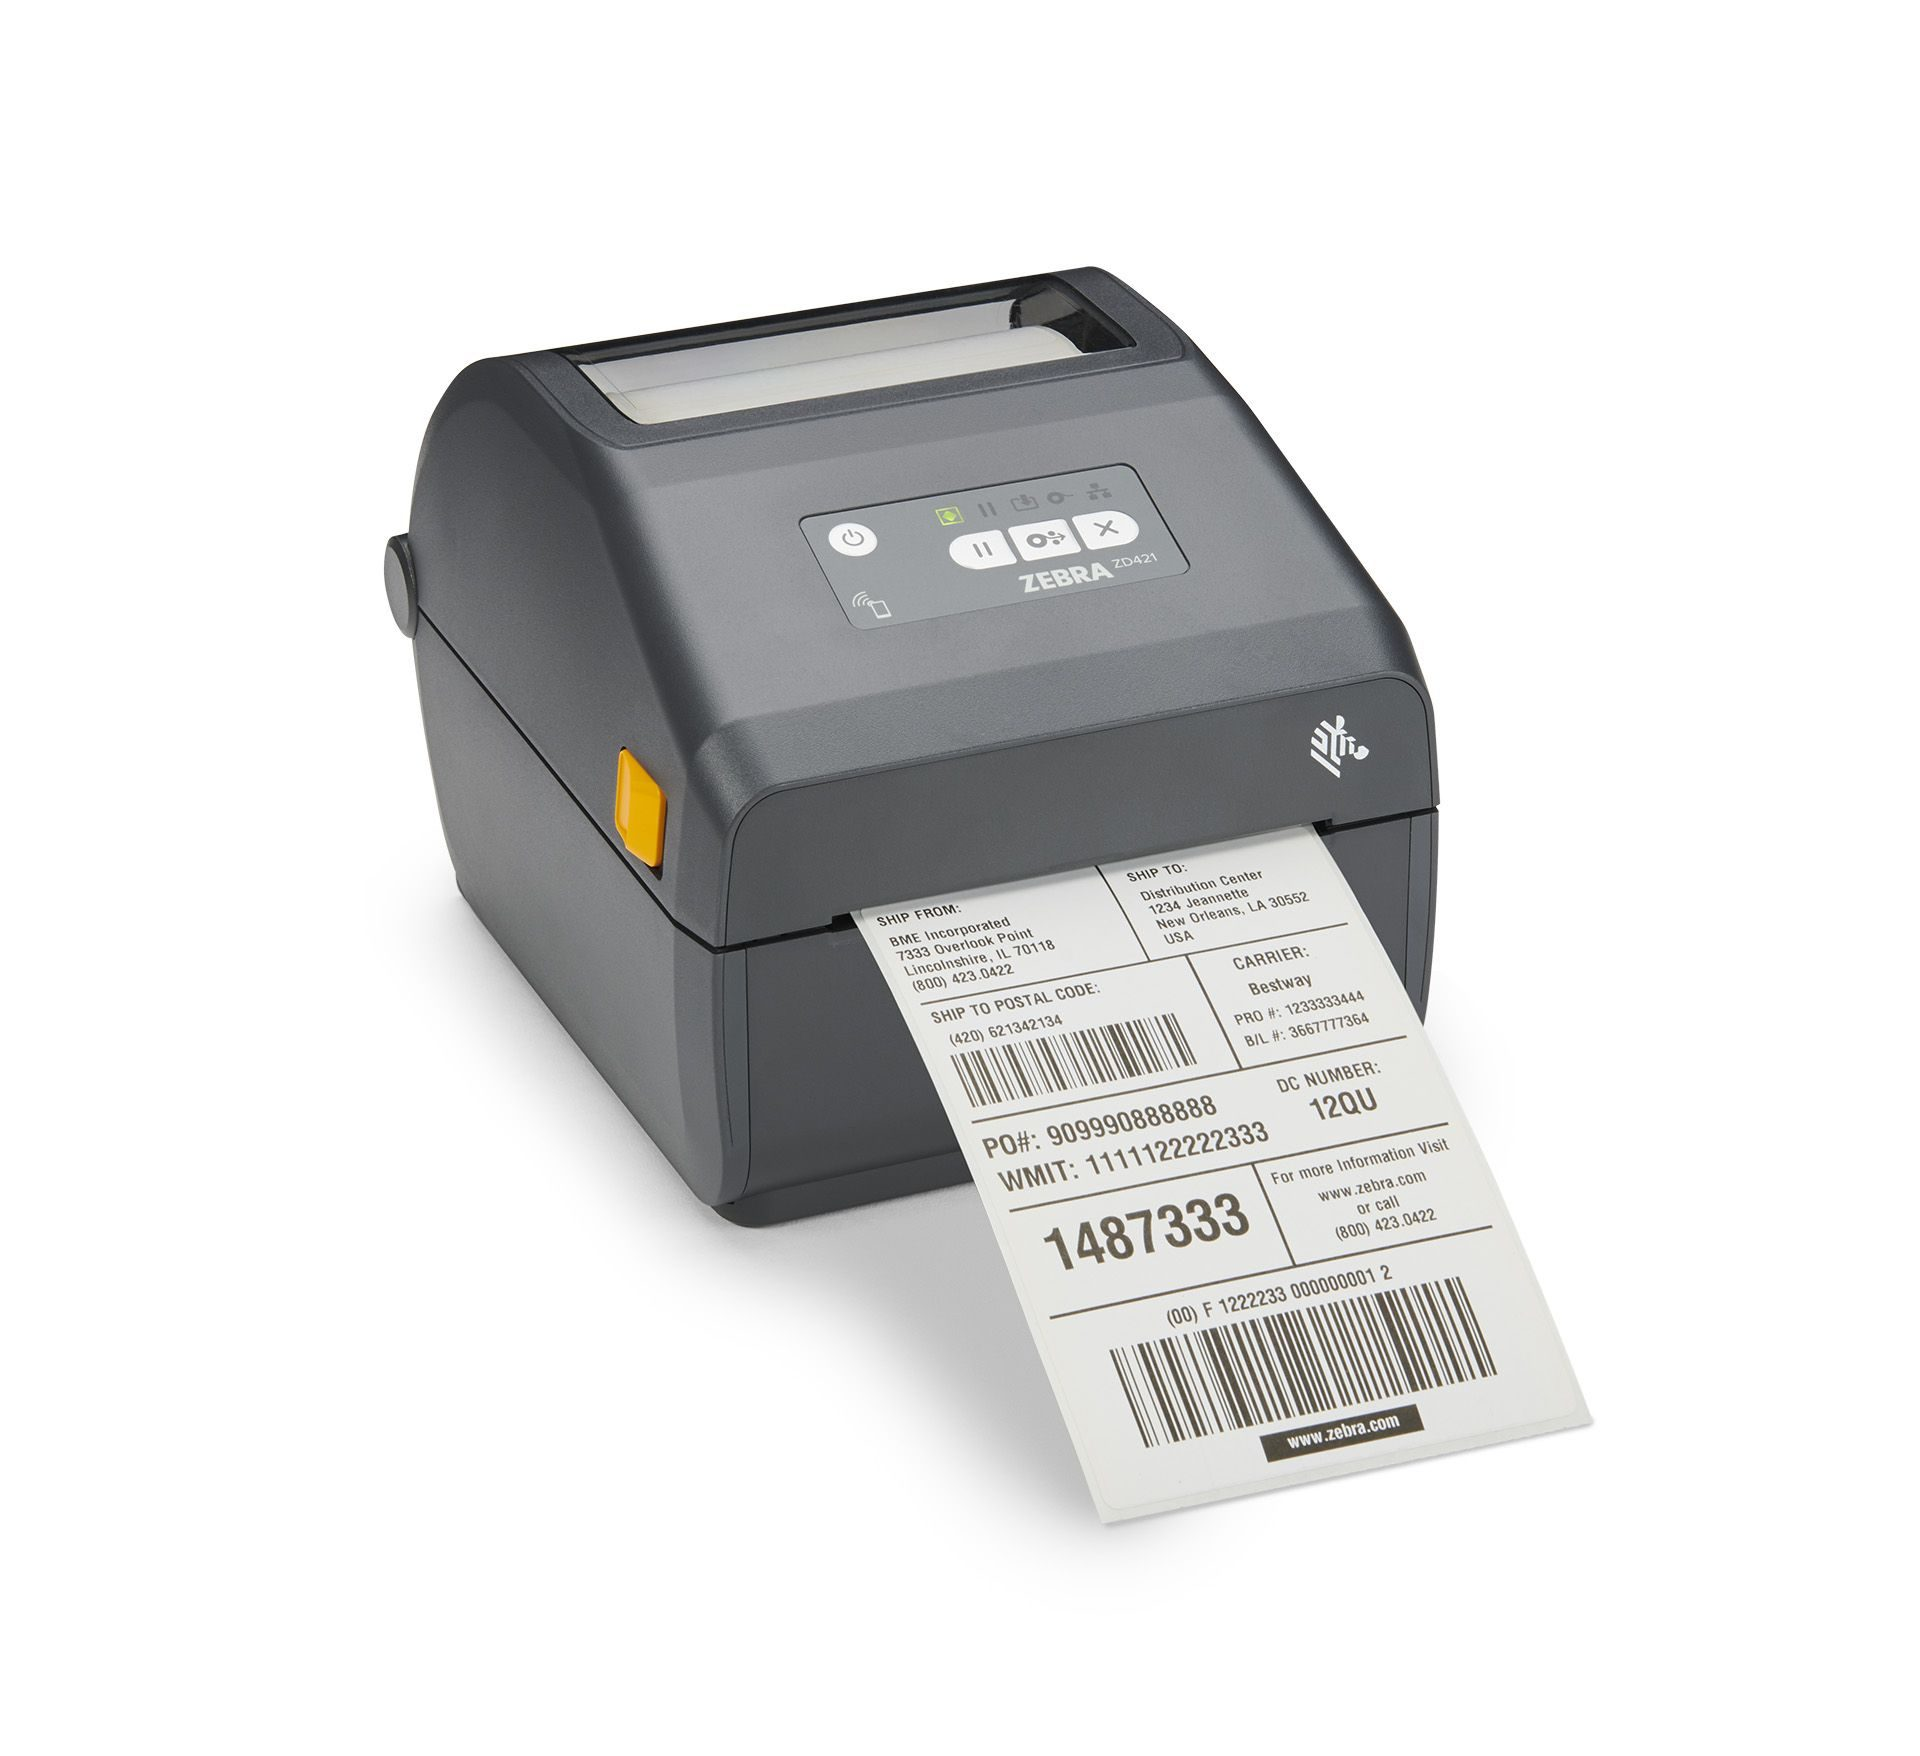 Zebra ZD421 labelprinter